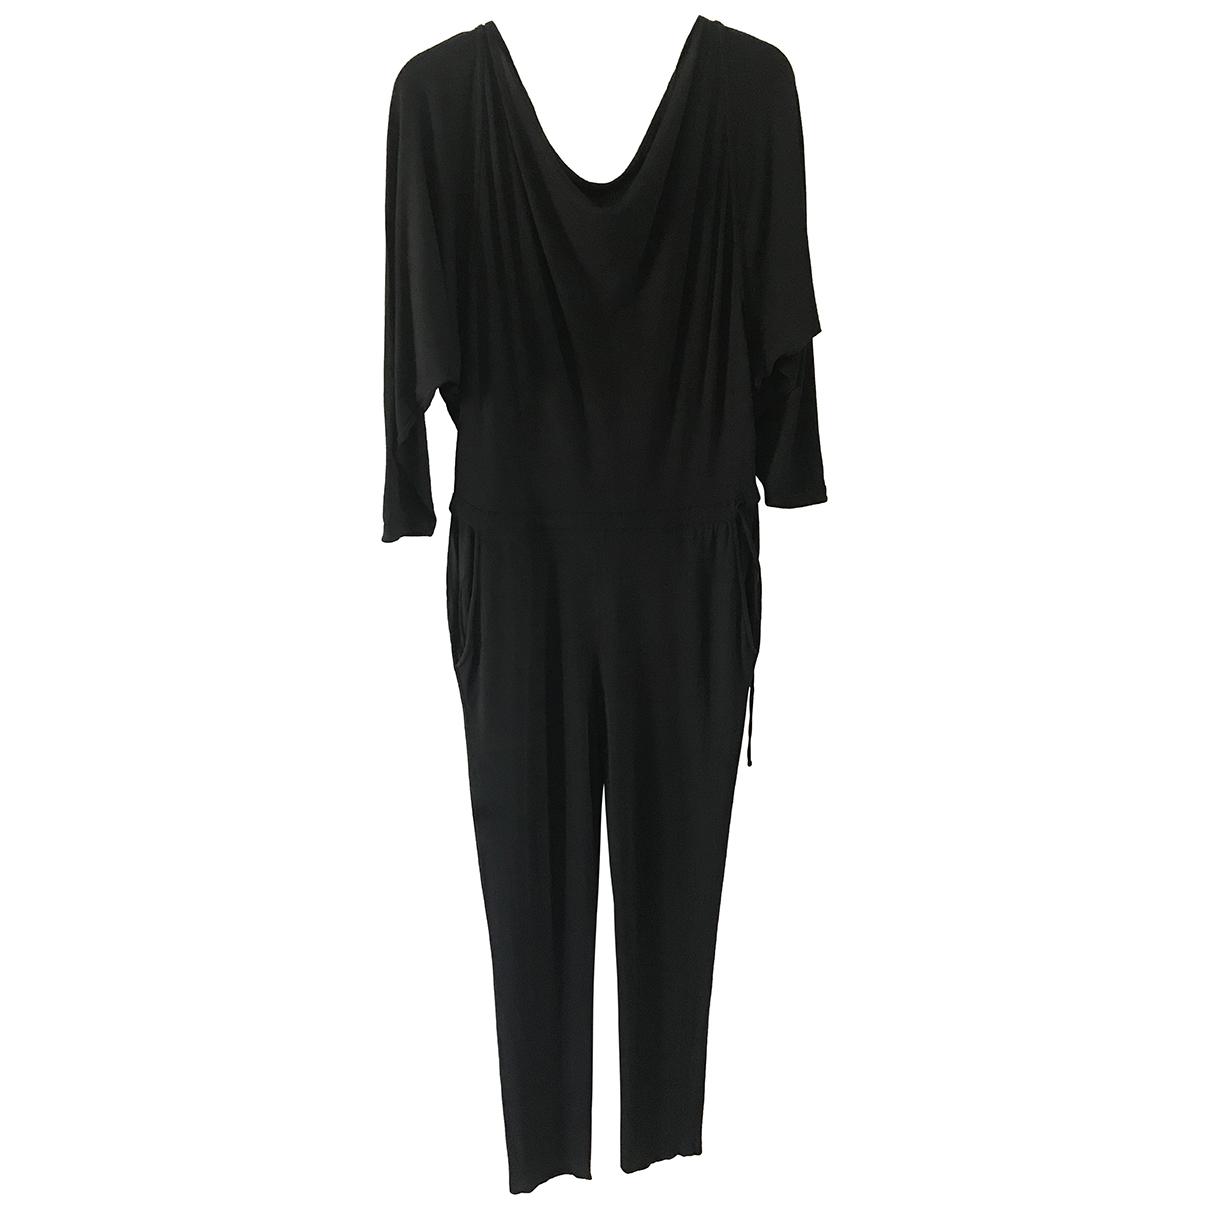 Stella Mccartney N Black Cotton jumpsuit for Women 38 IT